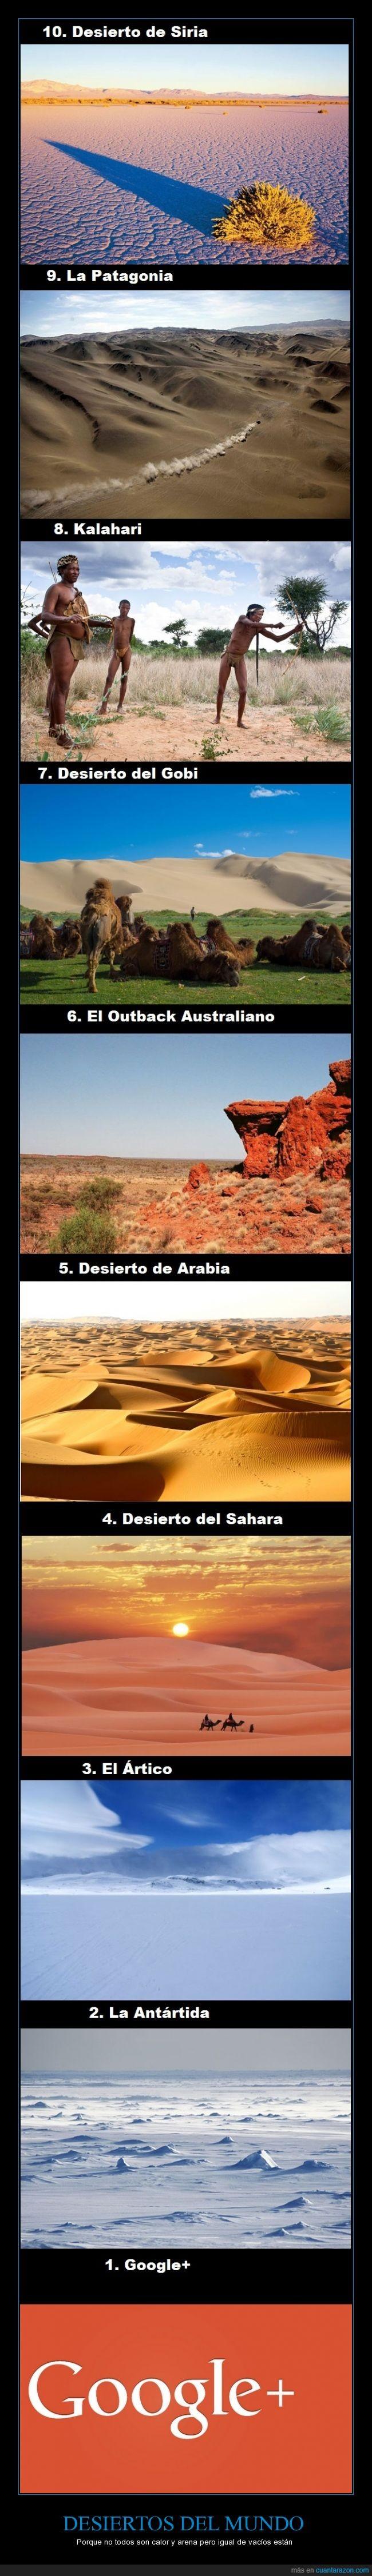 antartida,arabia,artico,desiertos,gobi,google+,kalahari,mi cuenta bancaria,sahara